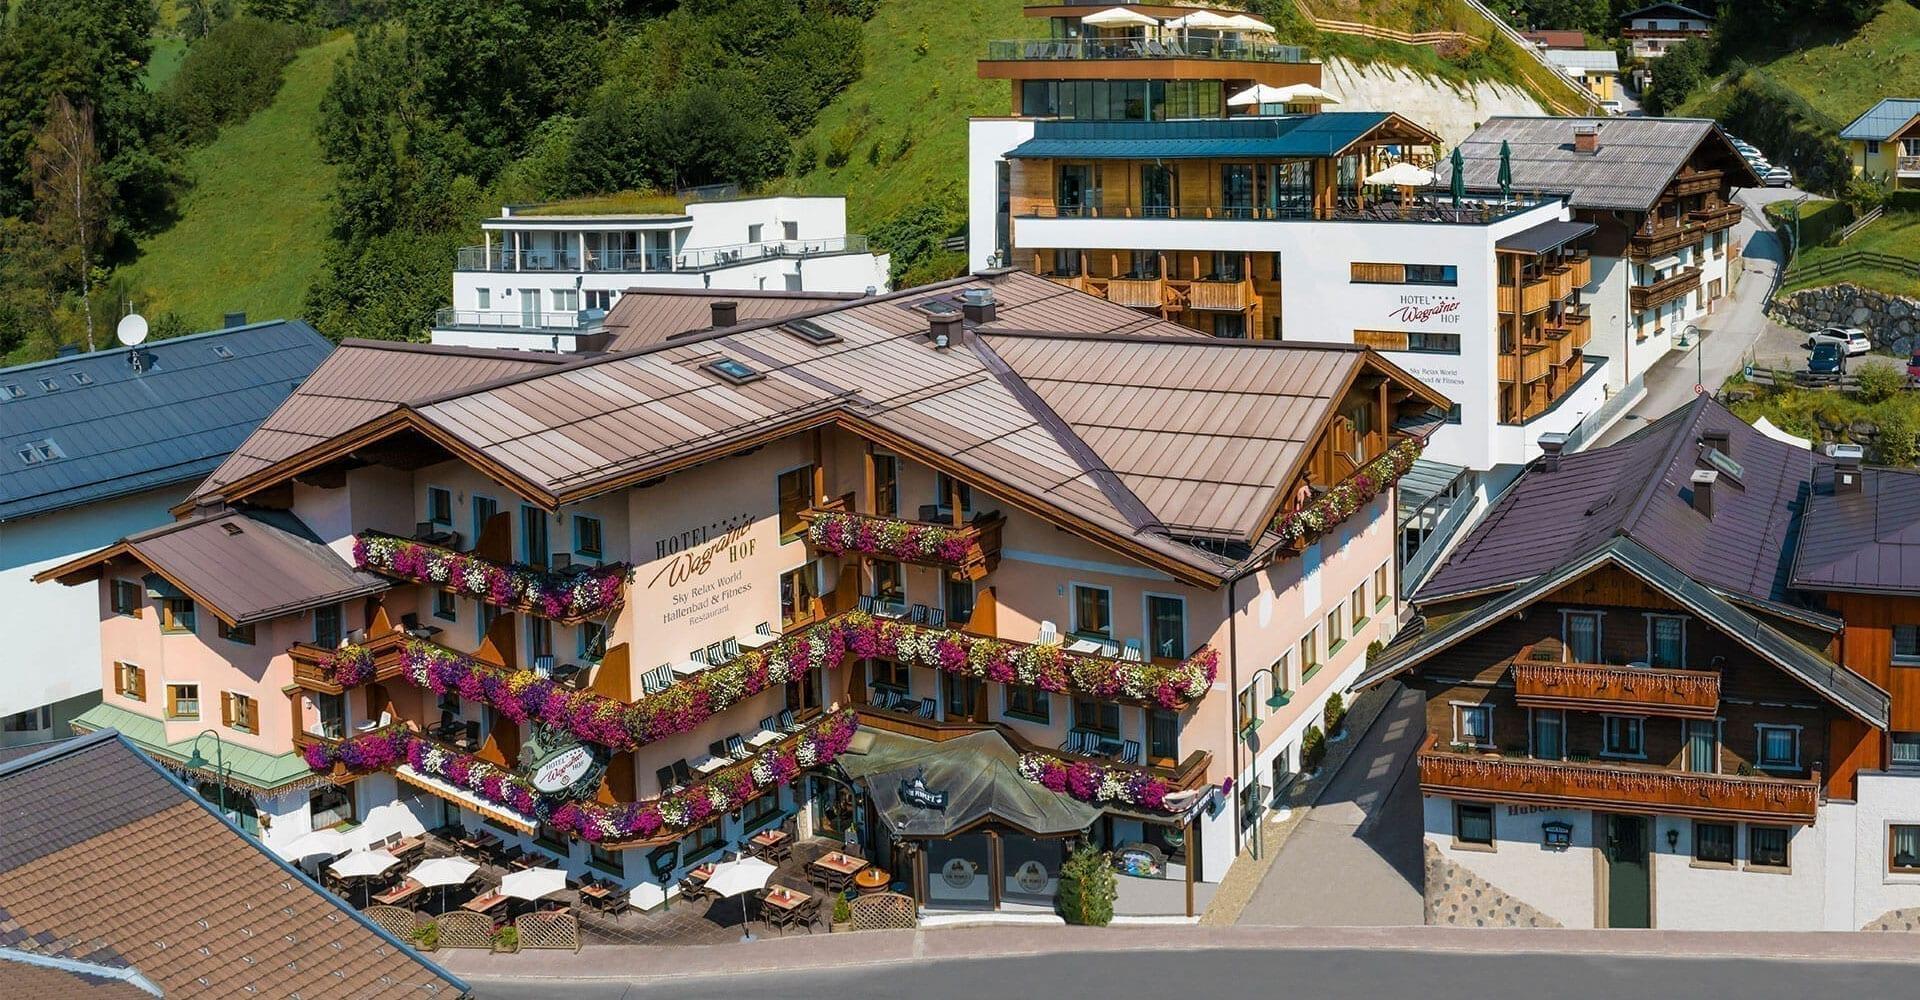 Hotel Wagrainerhof, 4 Sterne Hotel in Wagrain, Salzburg